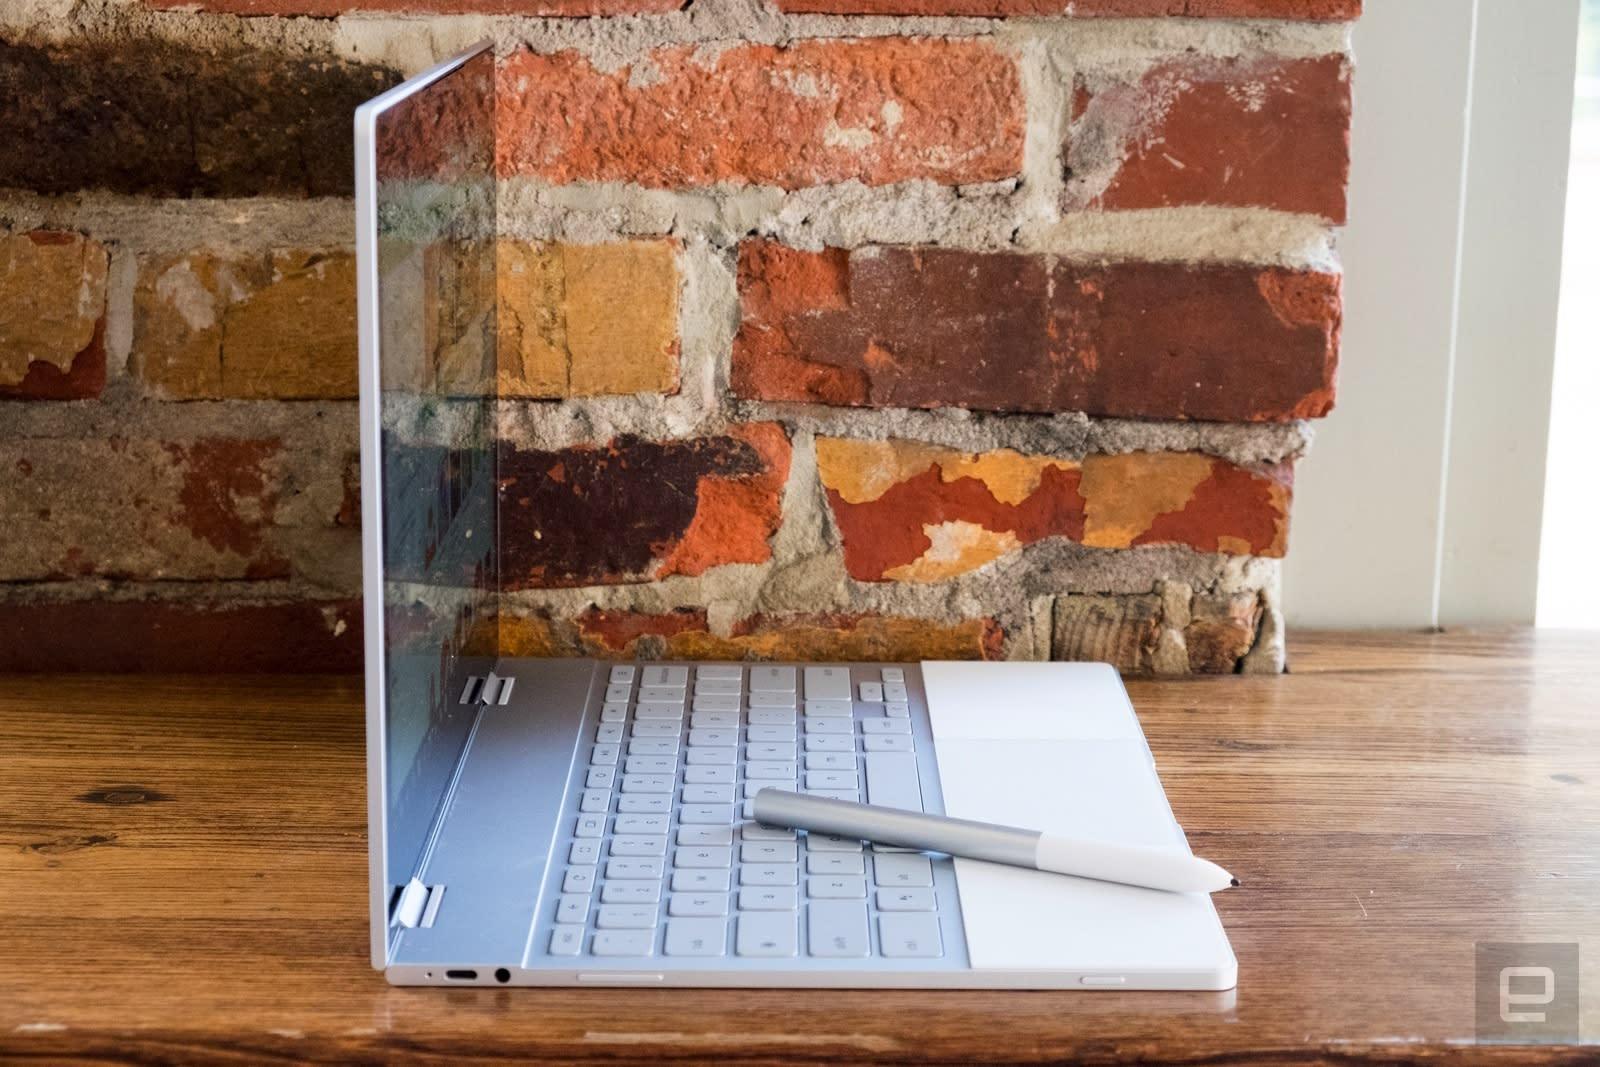 Chrome OS will block the USB ports on locked Chromebooks